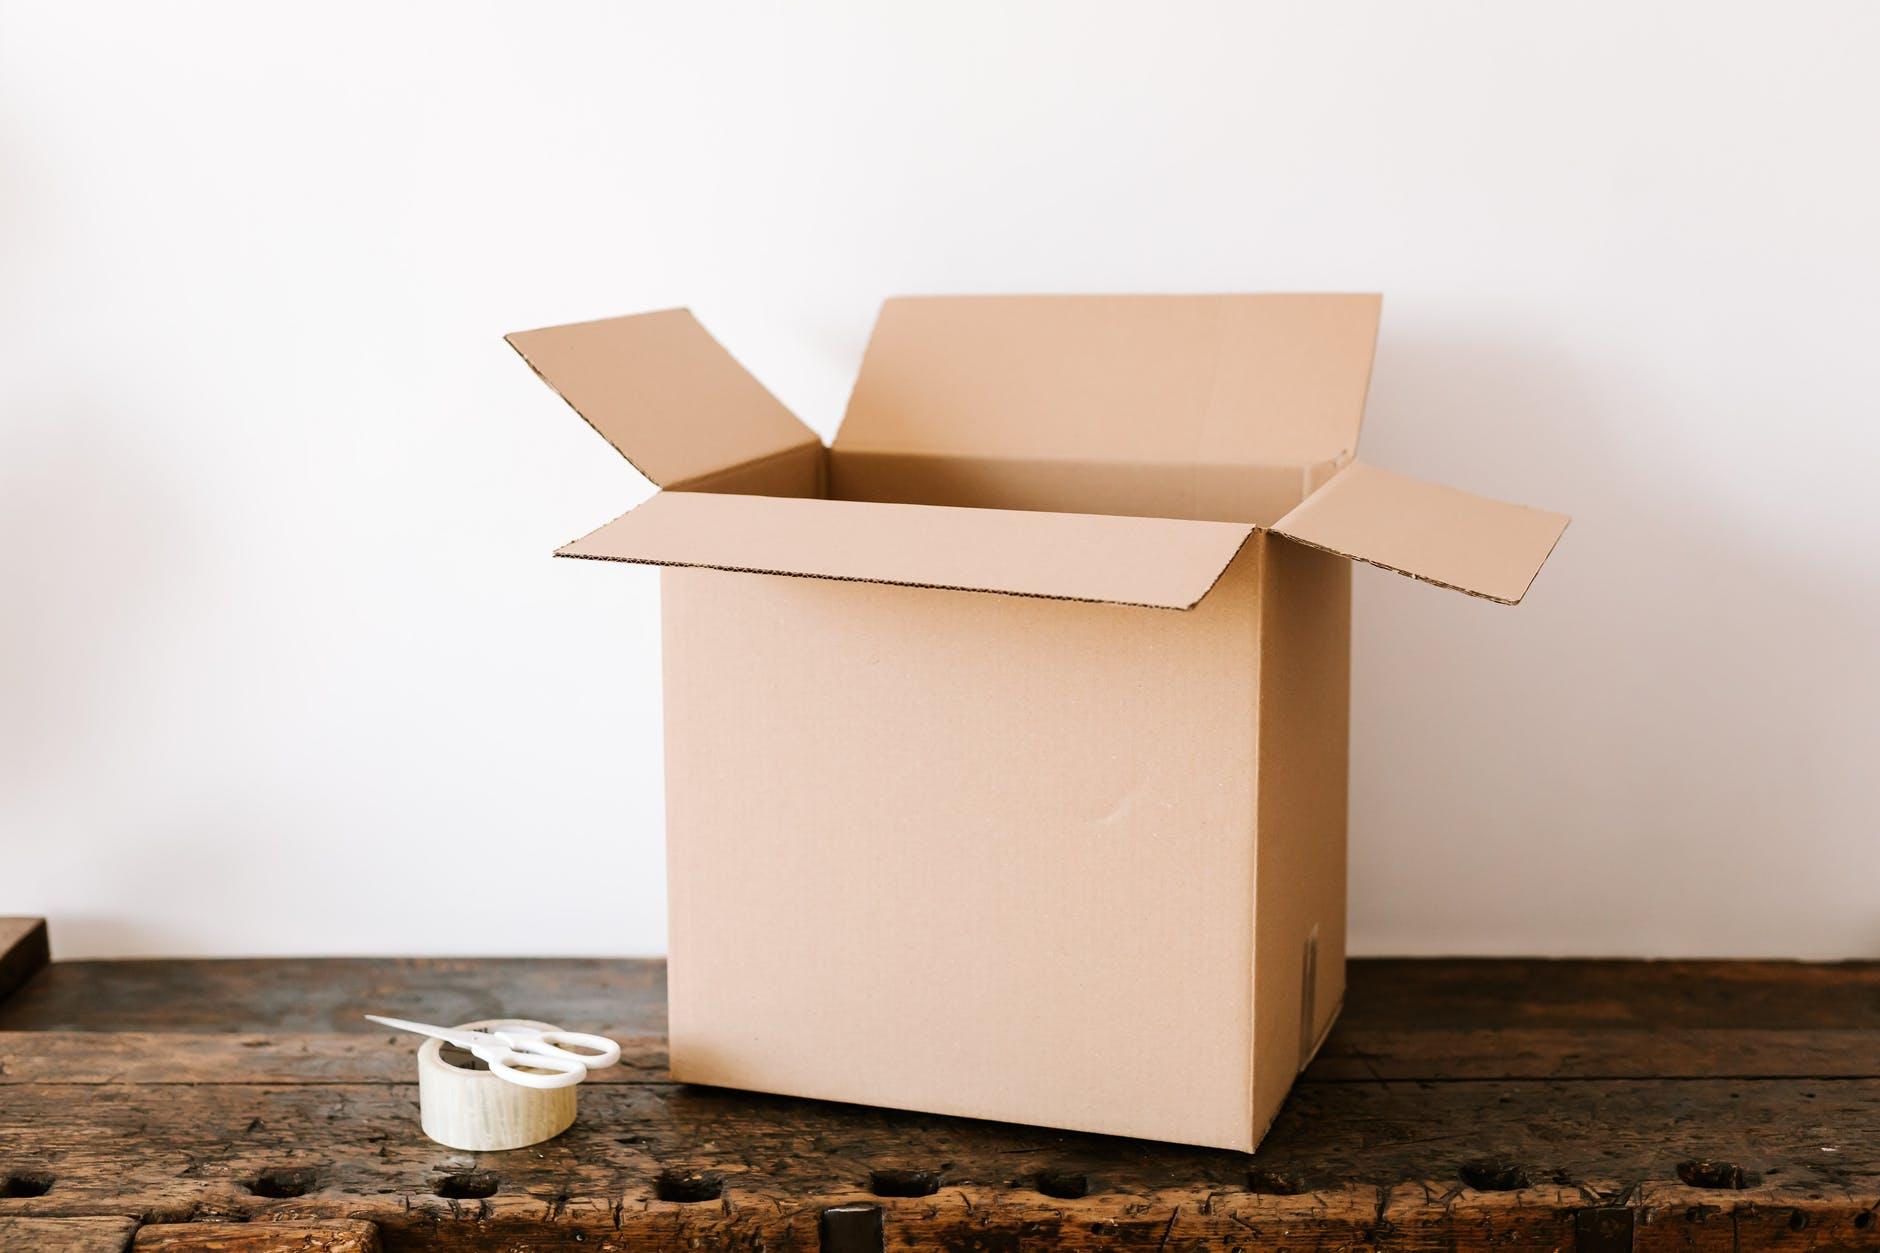 cardboard box on dark wooden table near tape and scissors